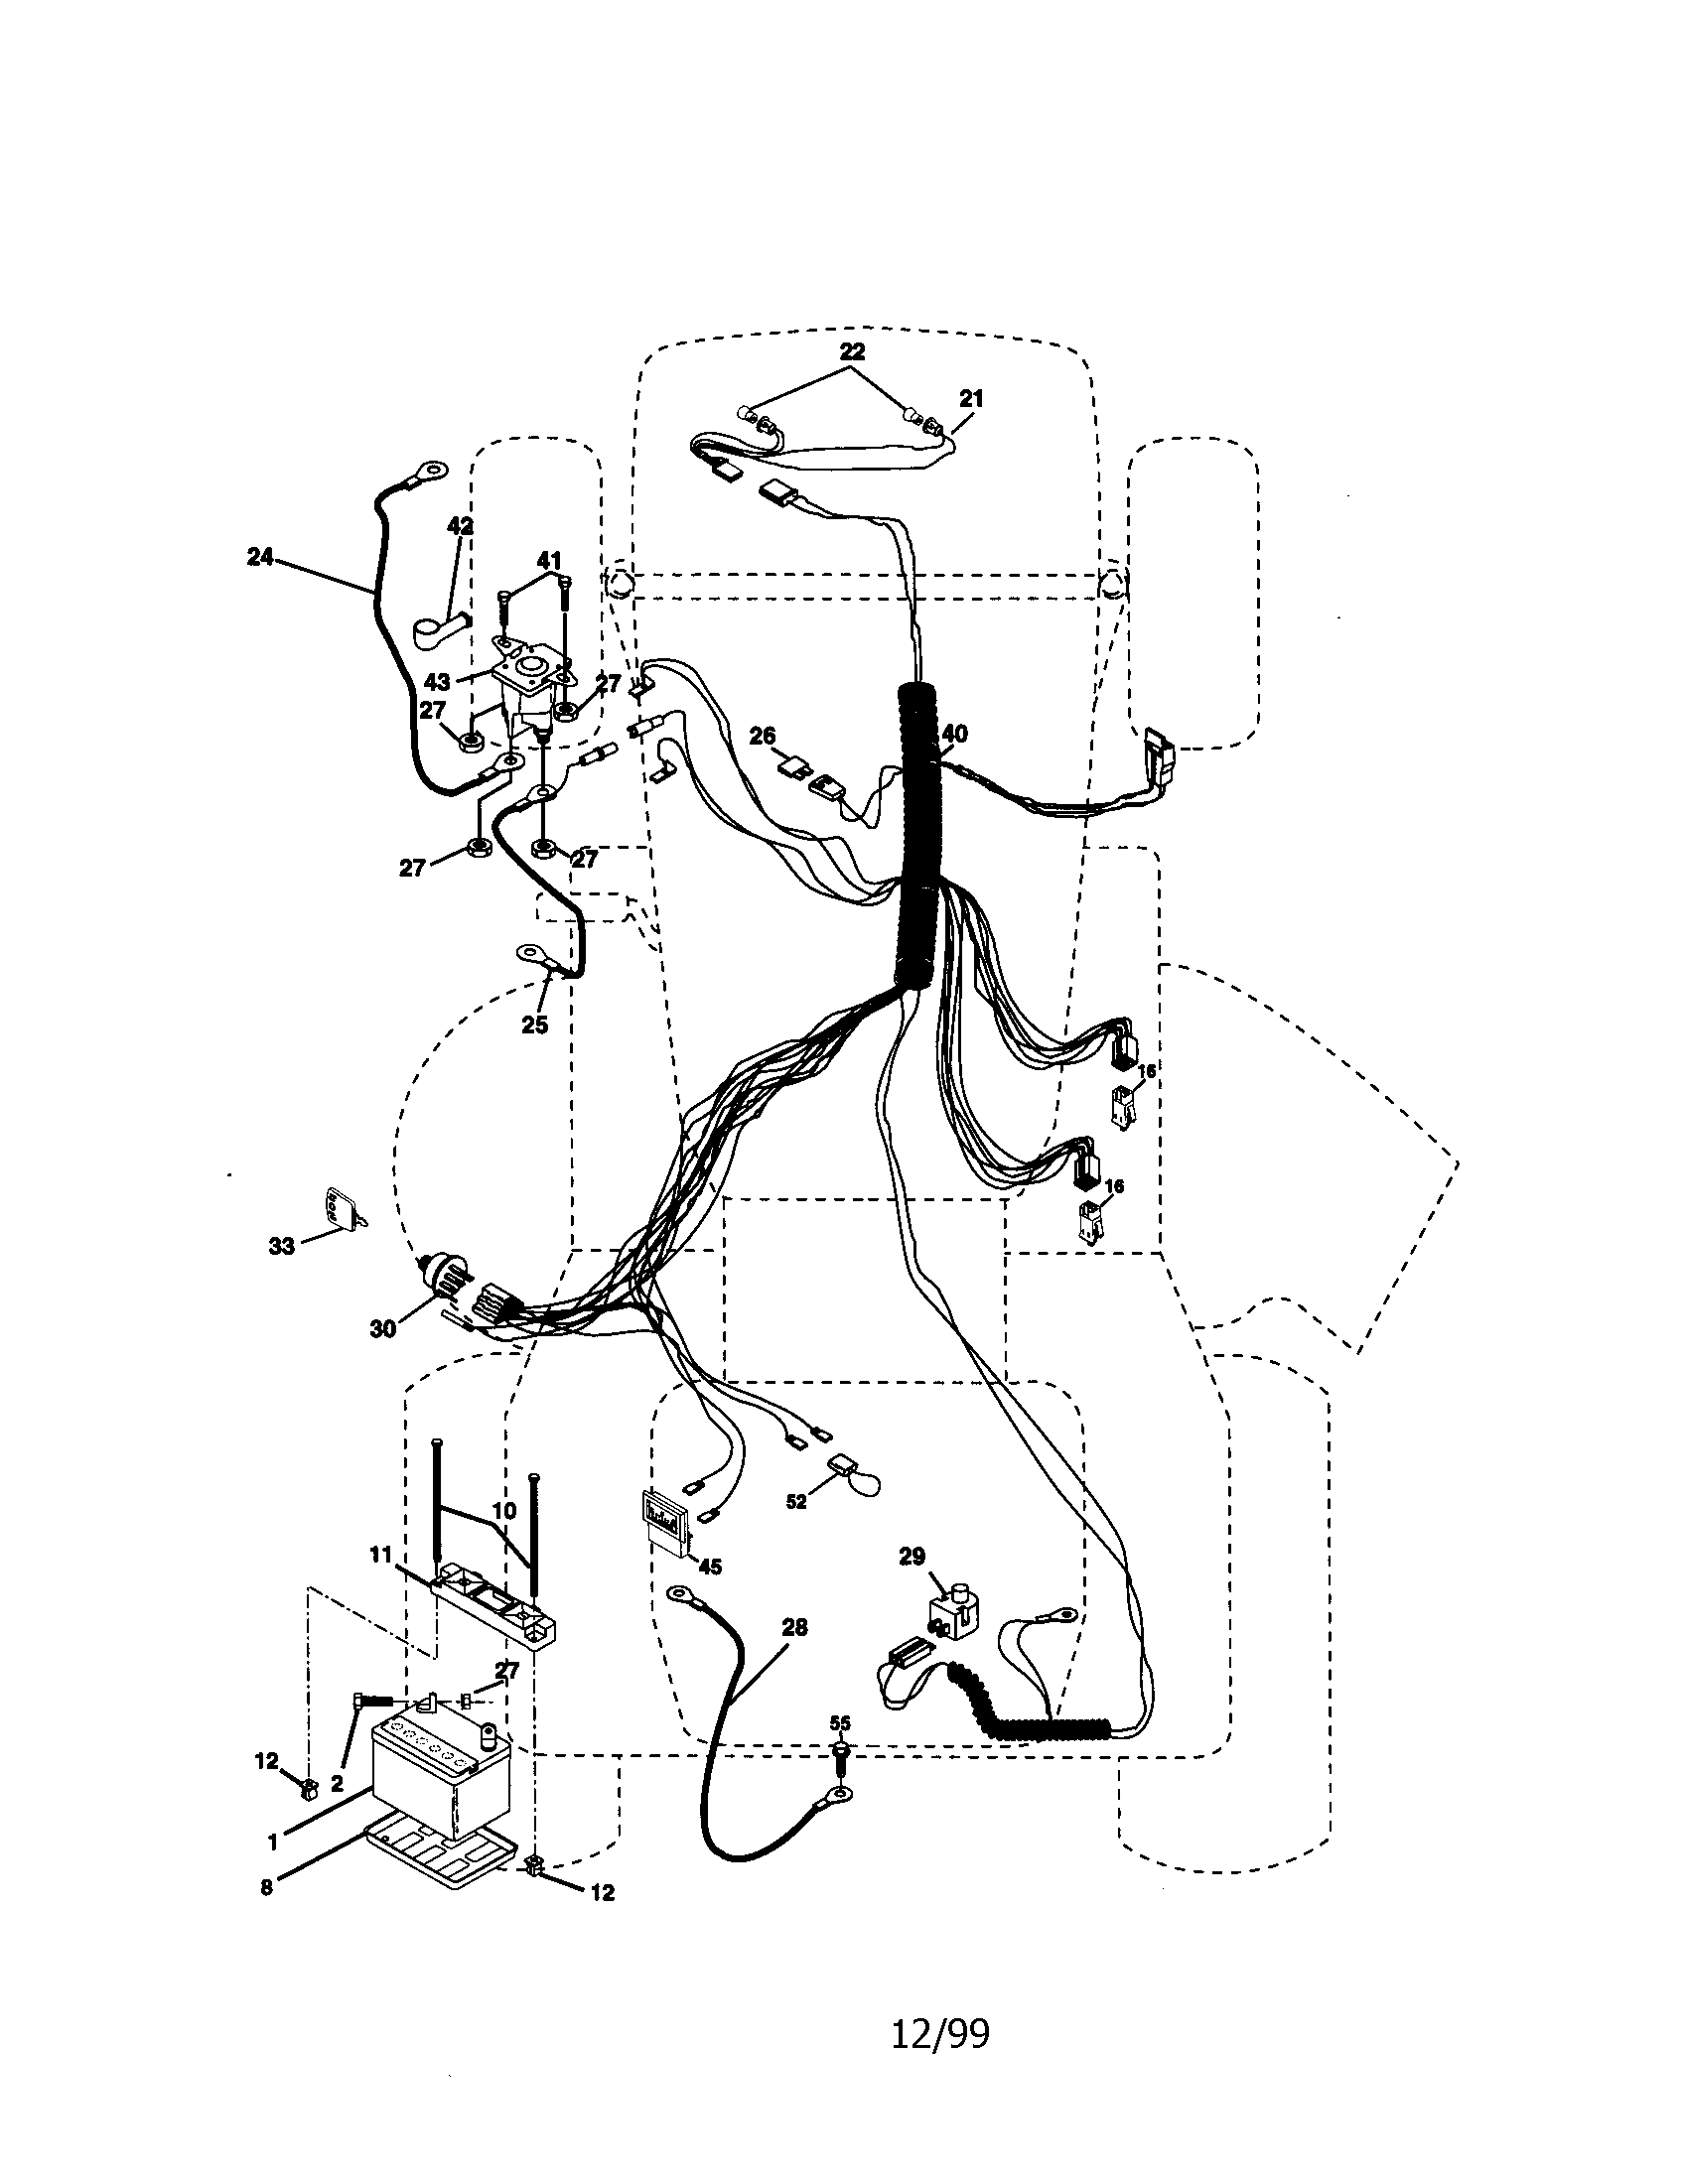 Lt1000 Wiring Diagram 17 5hp In Addition Craftsman Riding